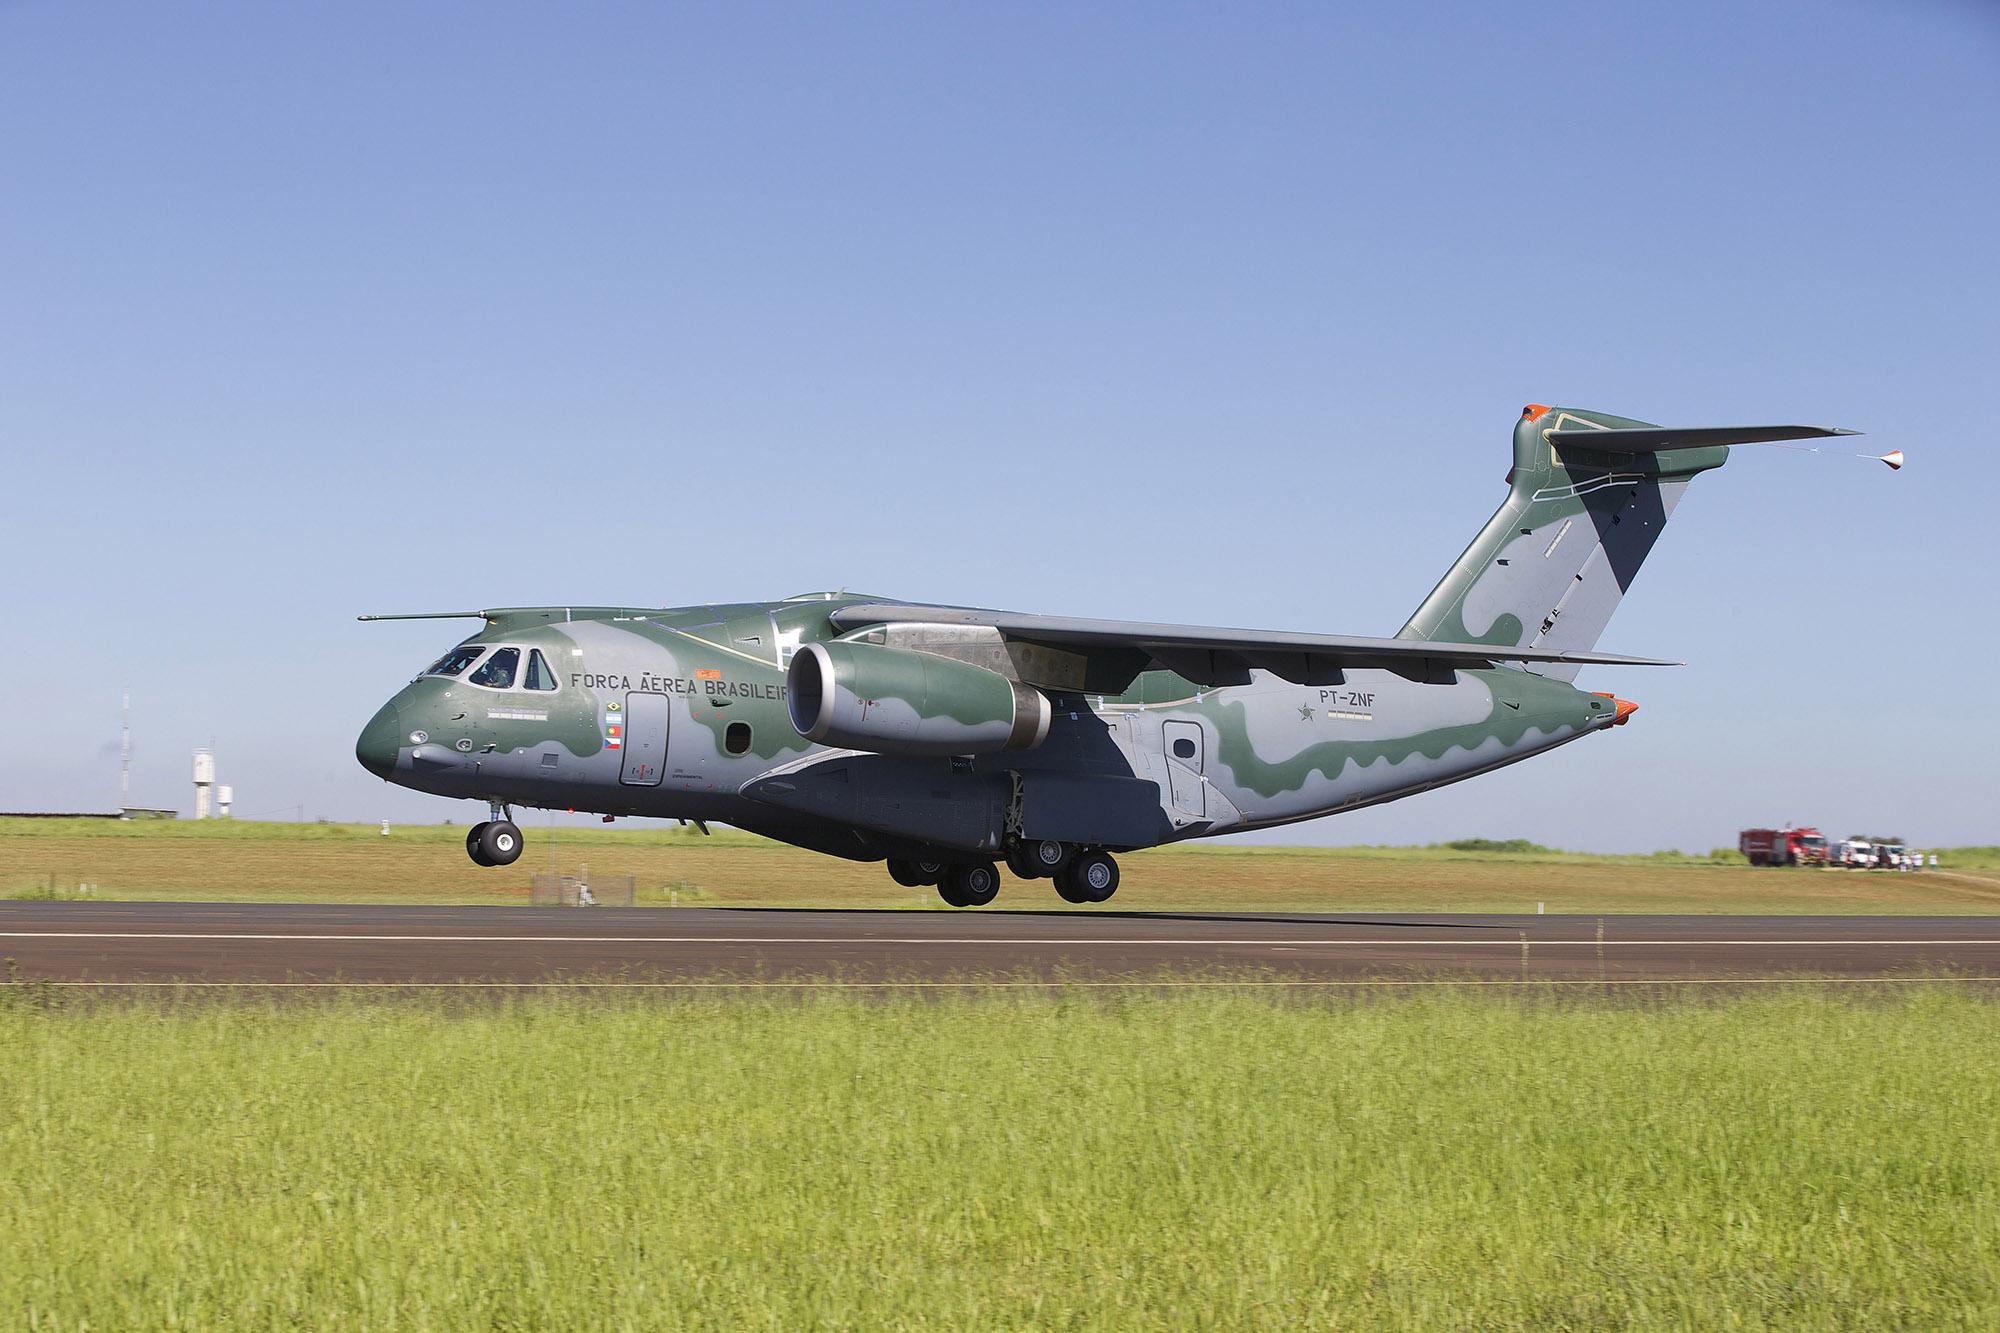 EMBRAER KC-390  - Página 6 Kc390-sjc